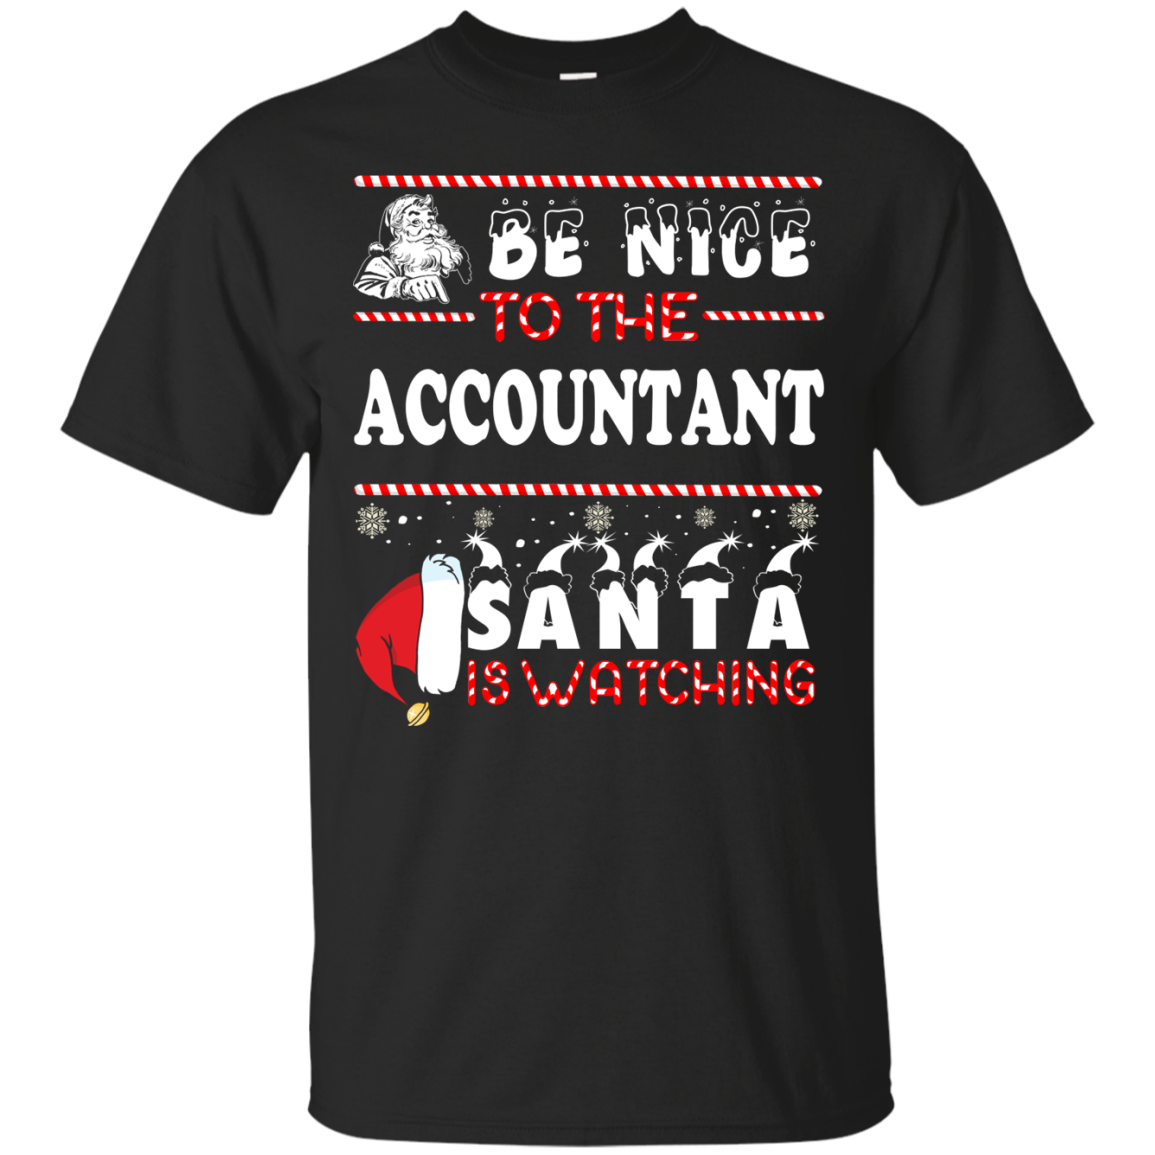 Be Nice To The Accountant Santa Is Watching Sweatshirt, T-Shirt